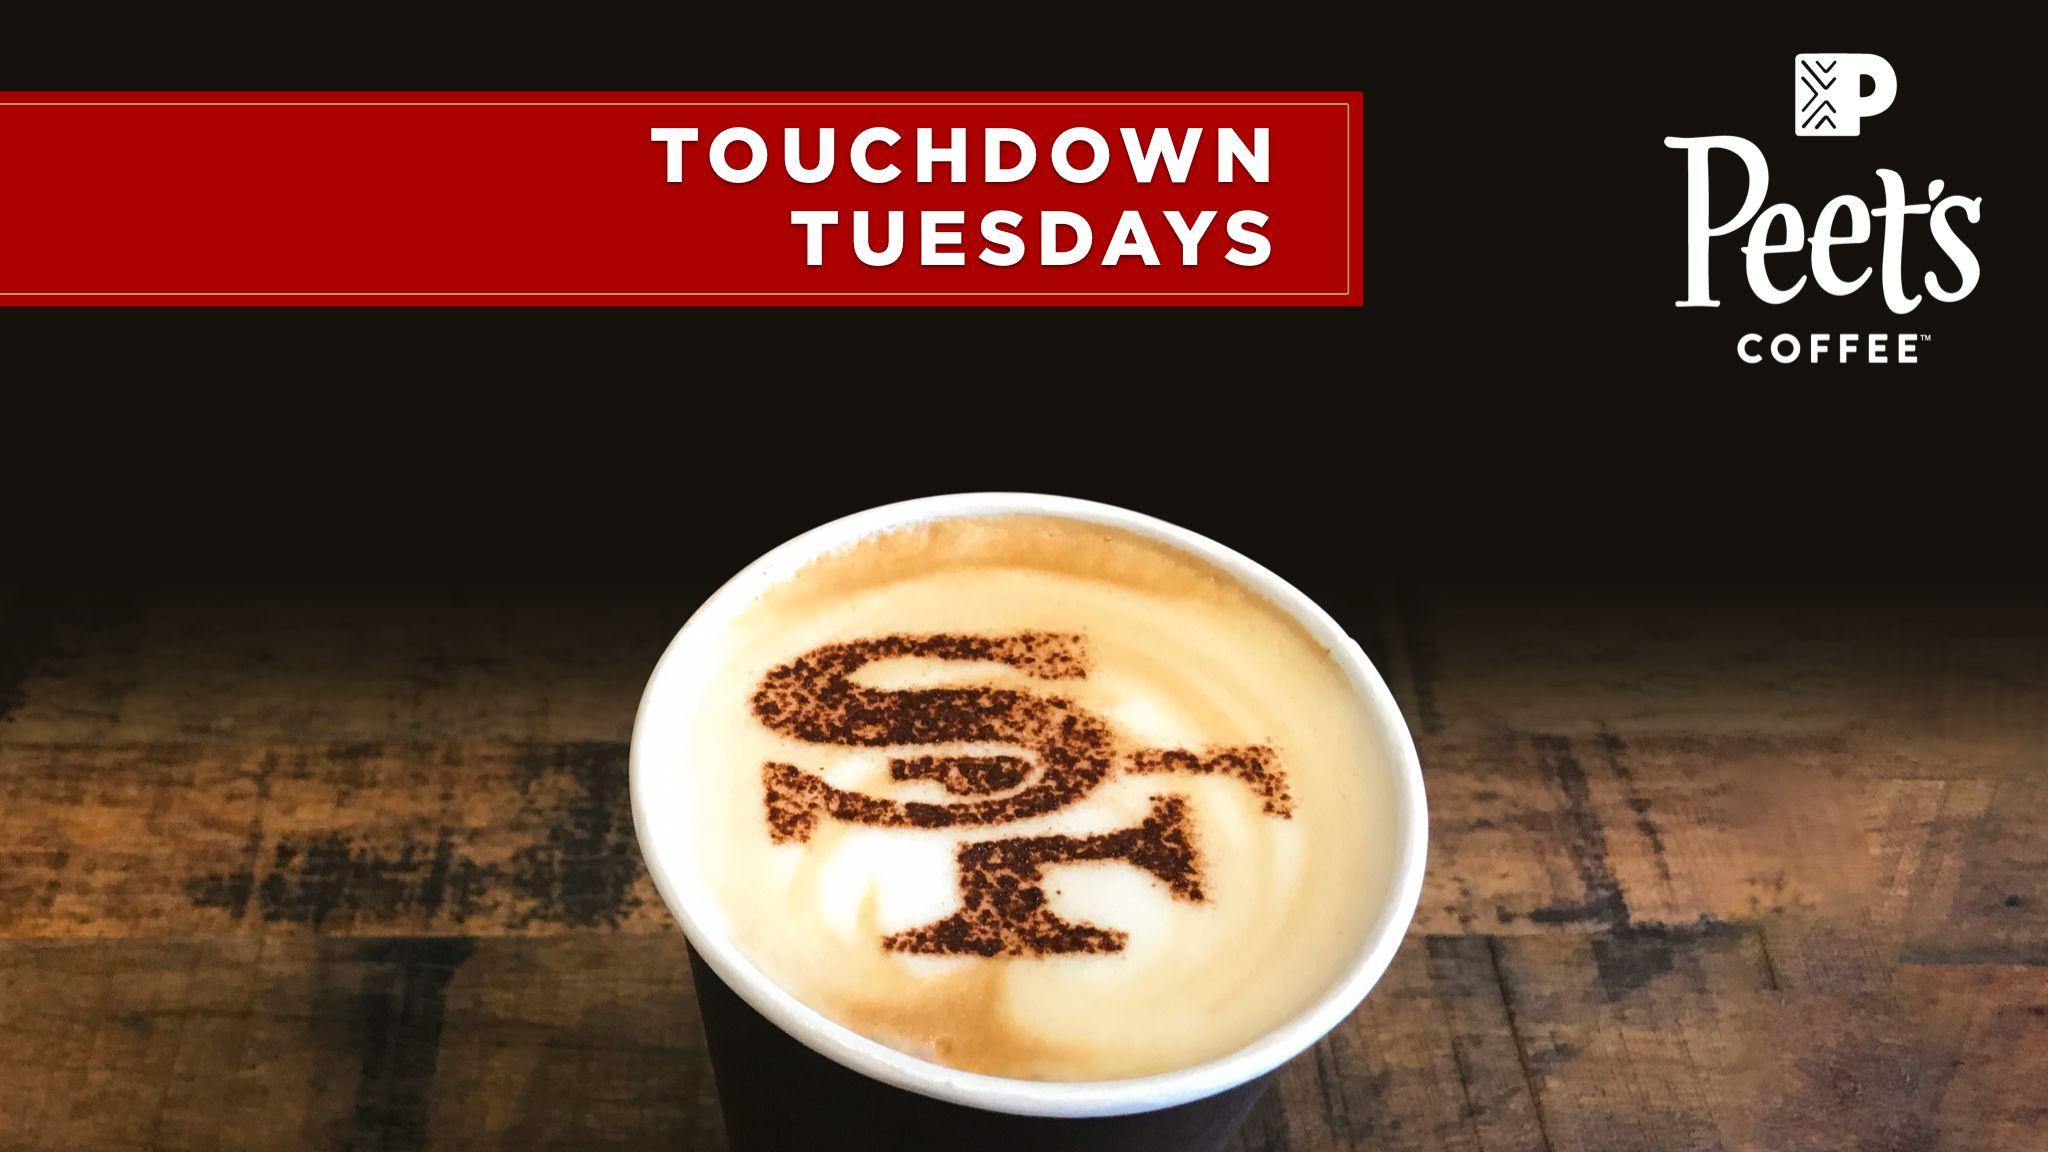 Peet's Touchdown Tuesday